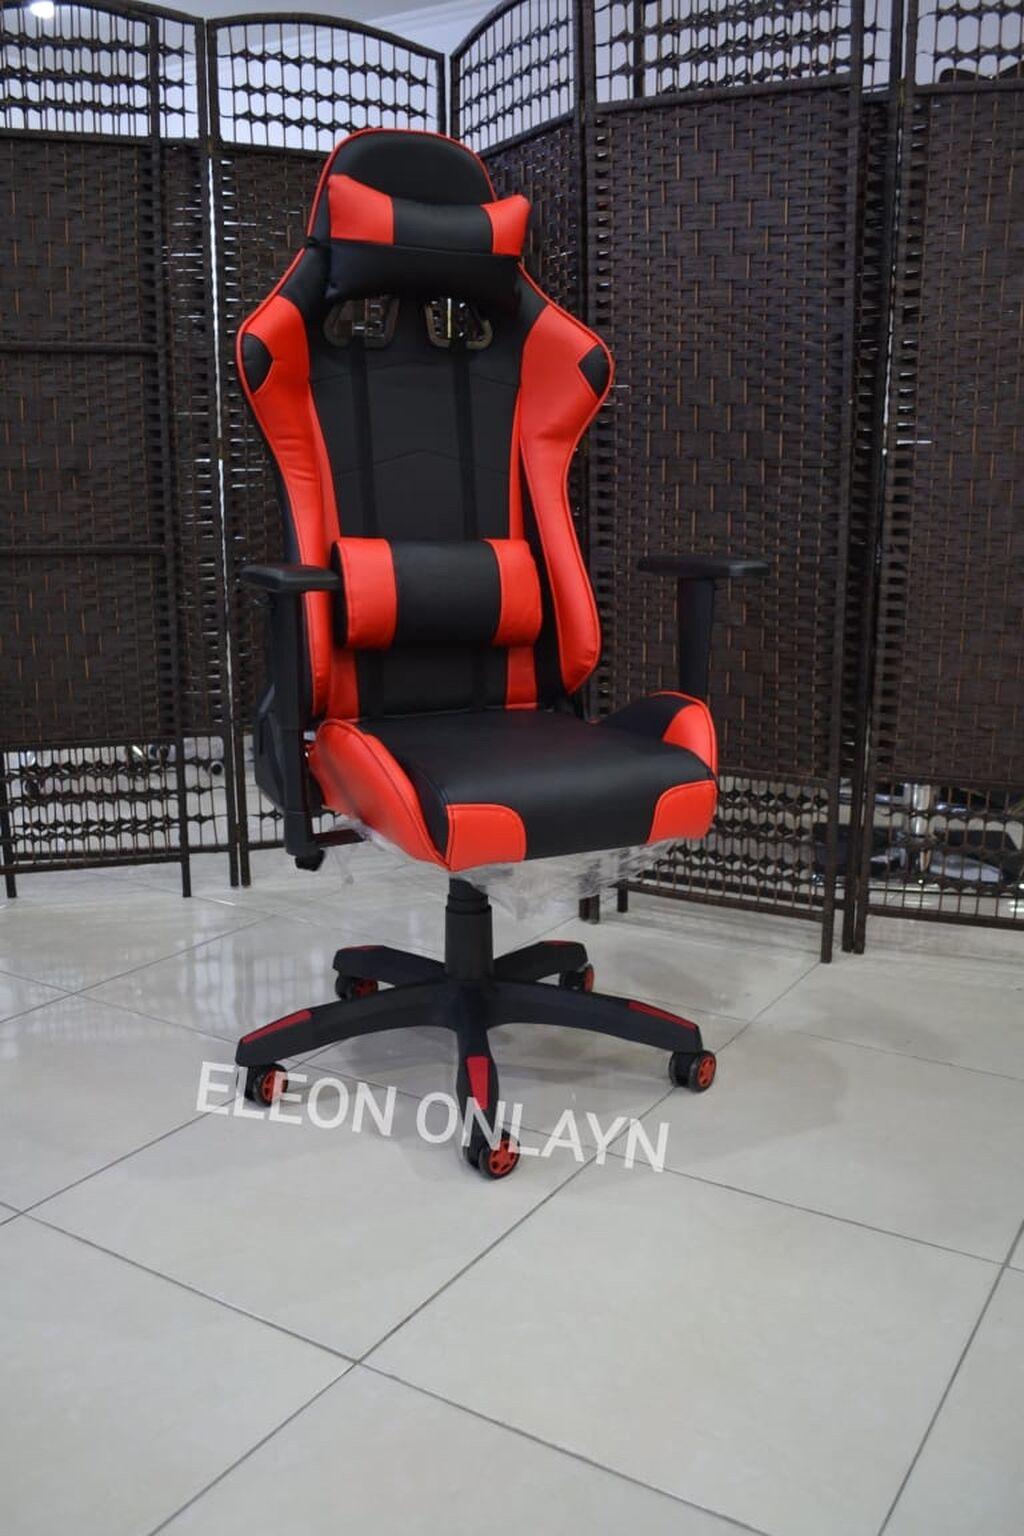 Gamer kreslo Геймерское кресло 300AZN